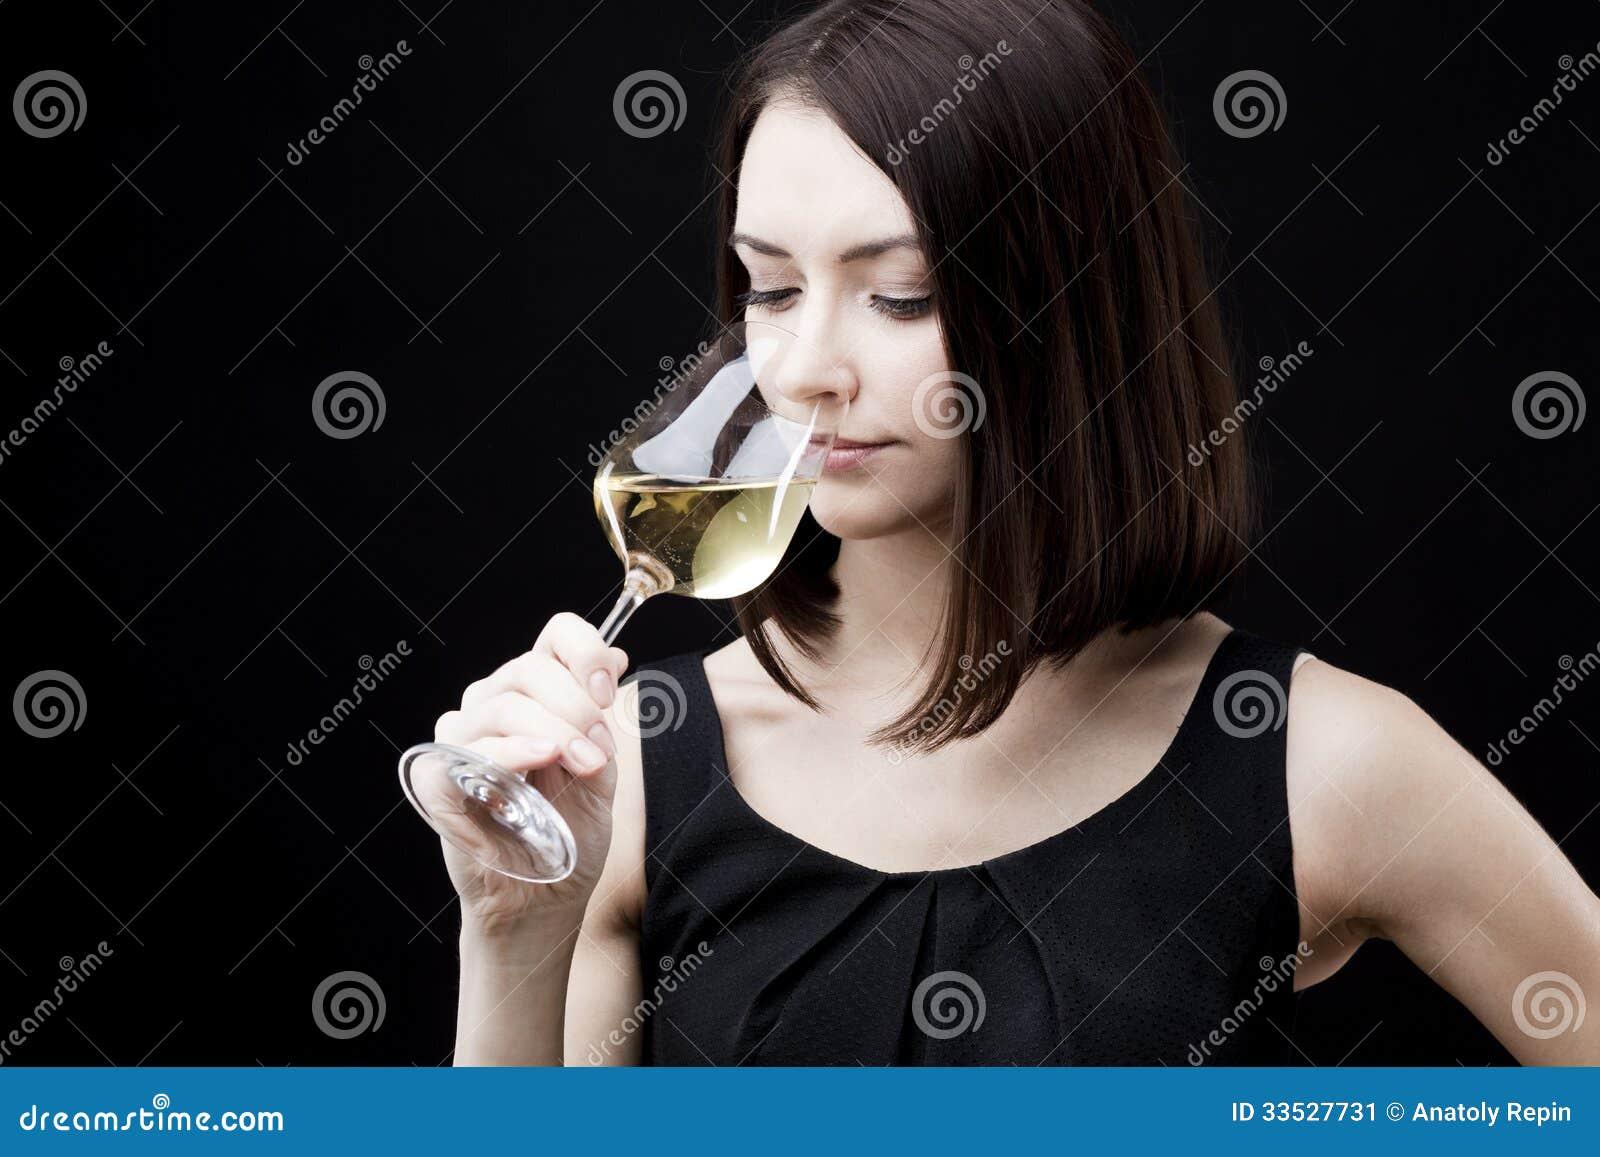 Woman Holding Wine Glass Stock Image - Image: 33527731